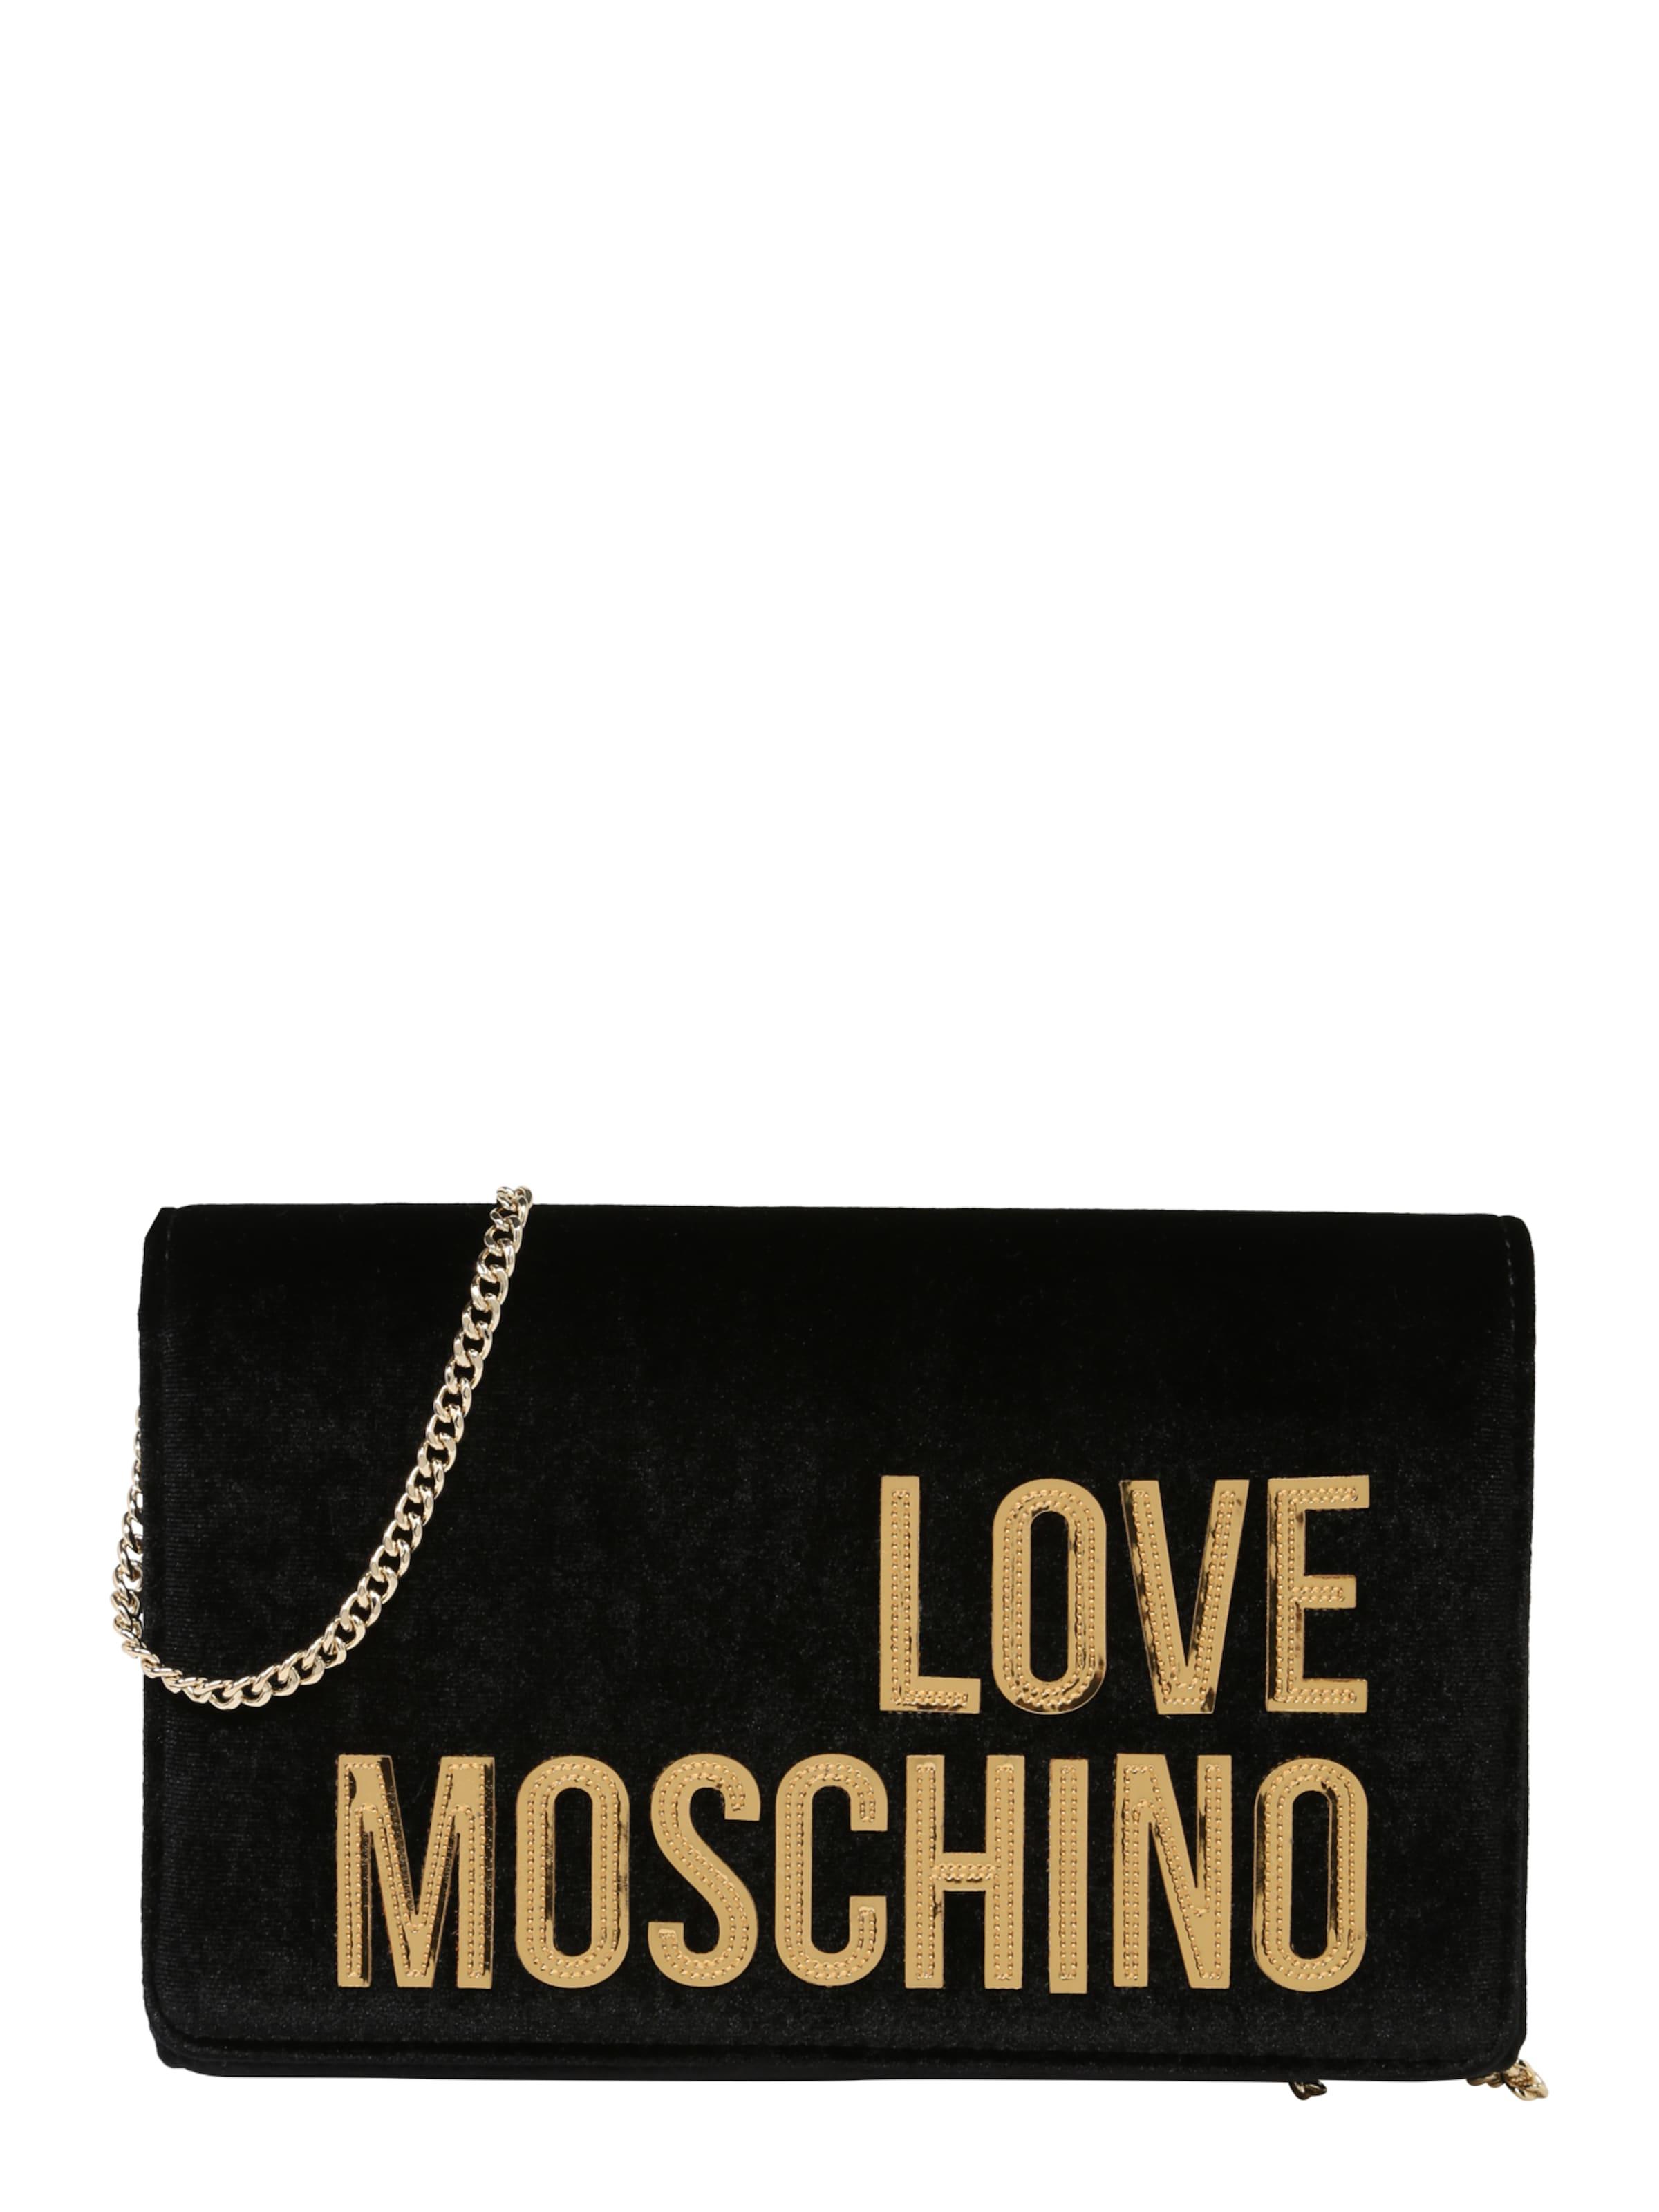 Pochette En Nero' 'borsa Moschino Velvet Noir Love SqUzVpGM